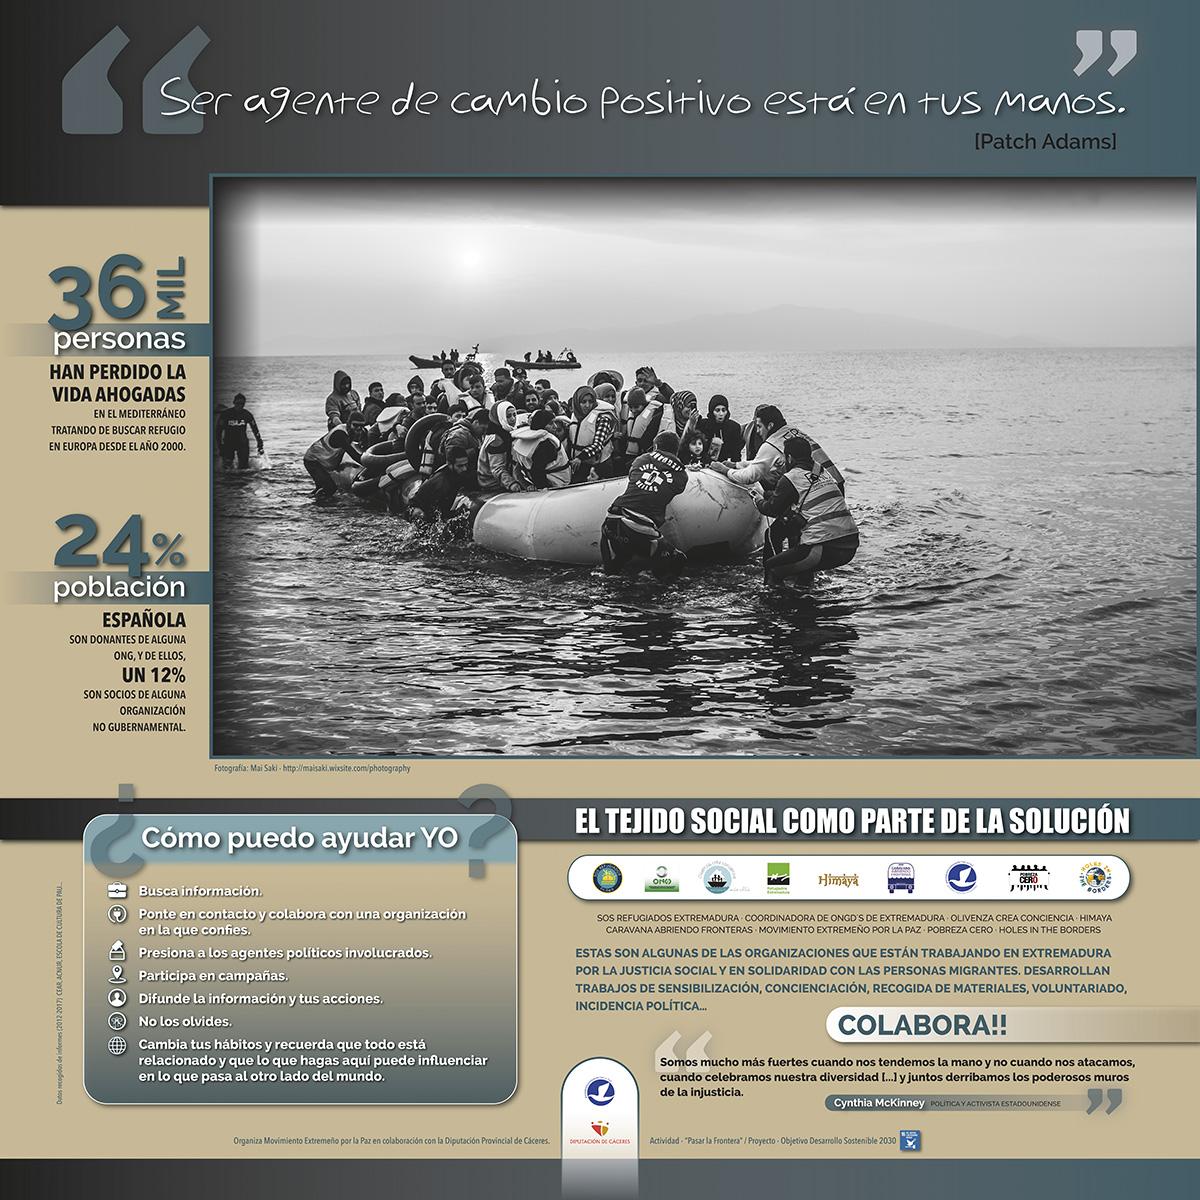 panel5-tejido-social-parte-de-la-solucion-#ningunserhumanoesilegal